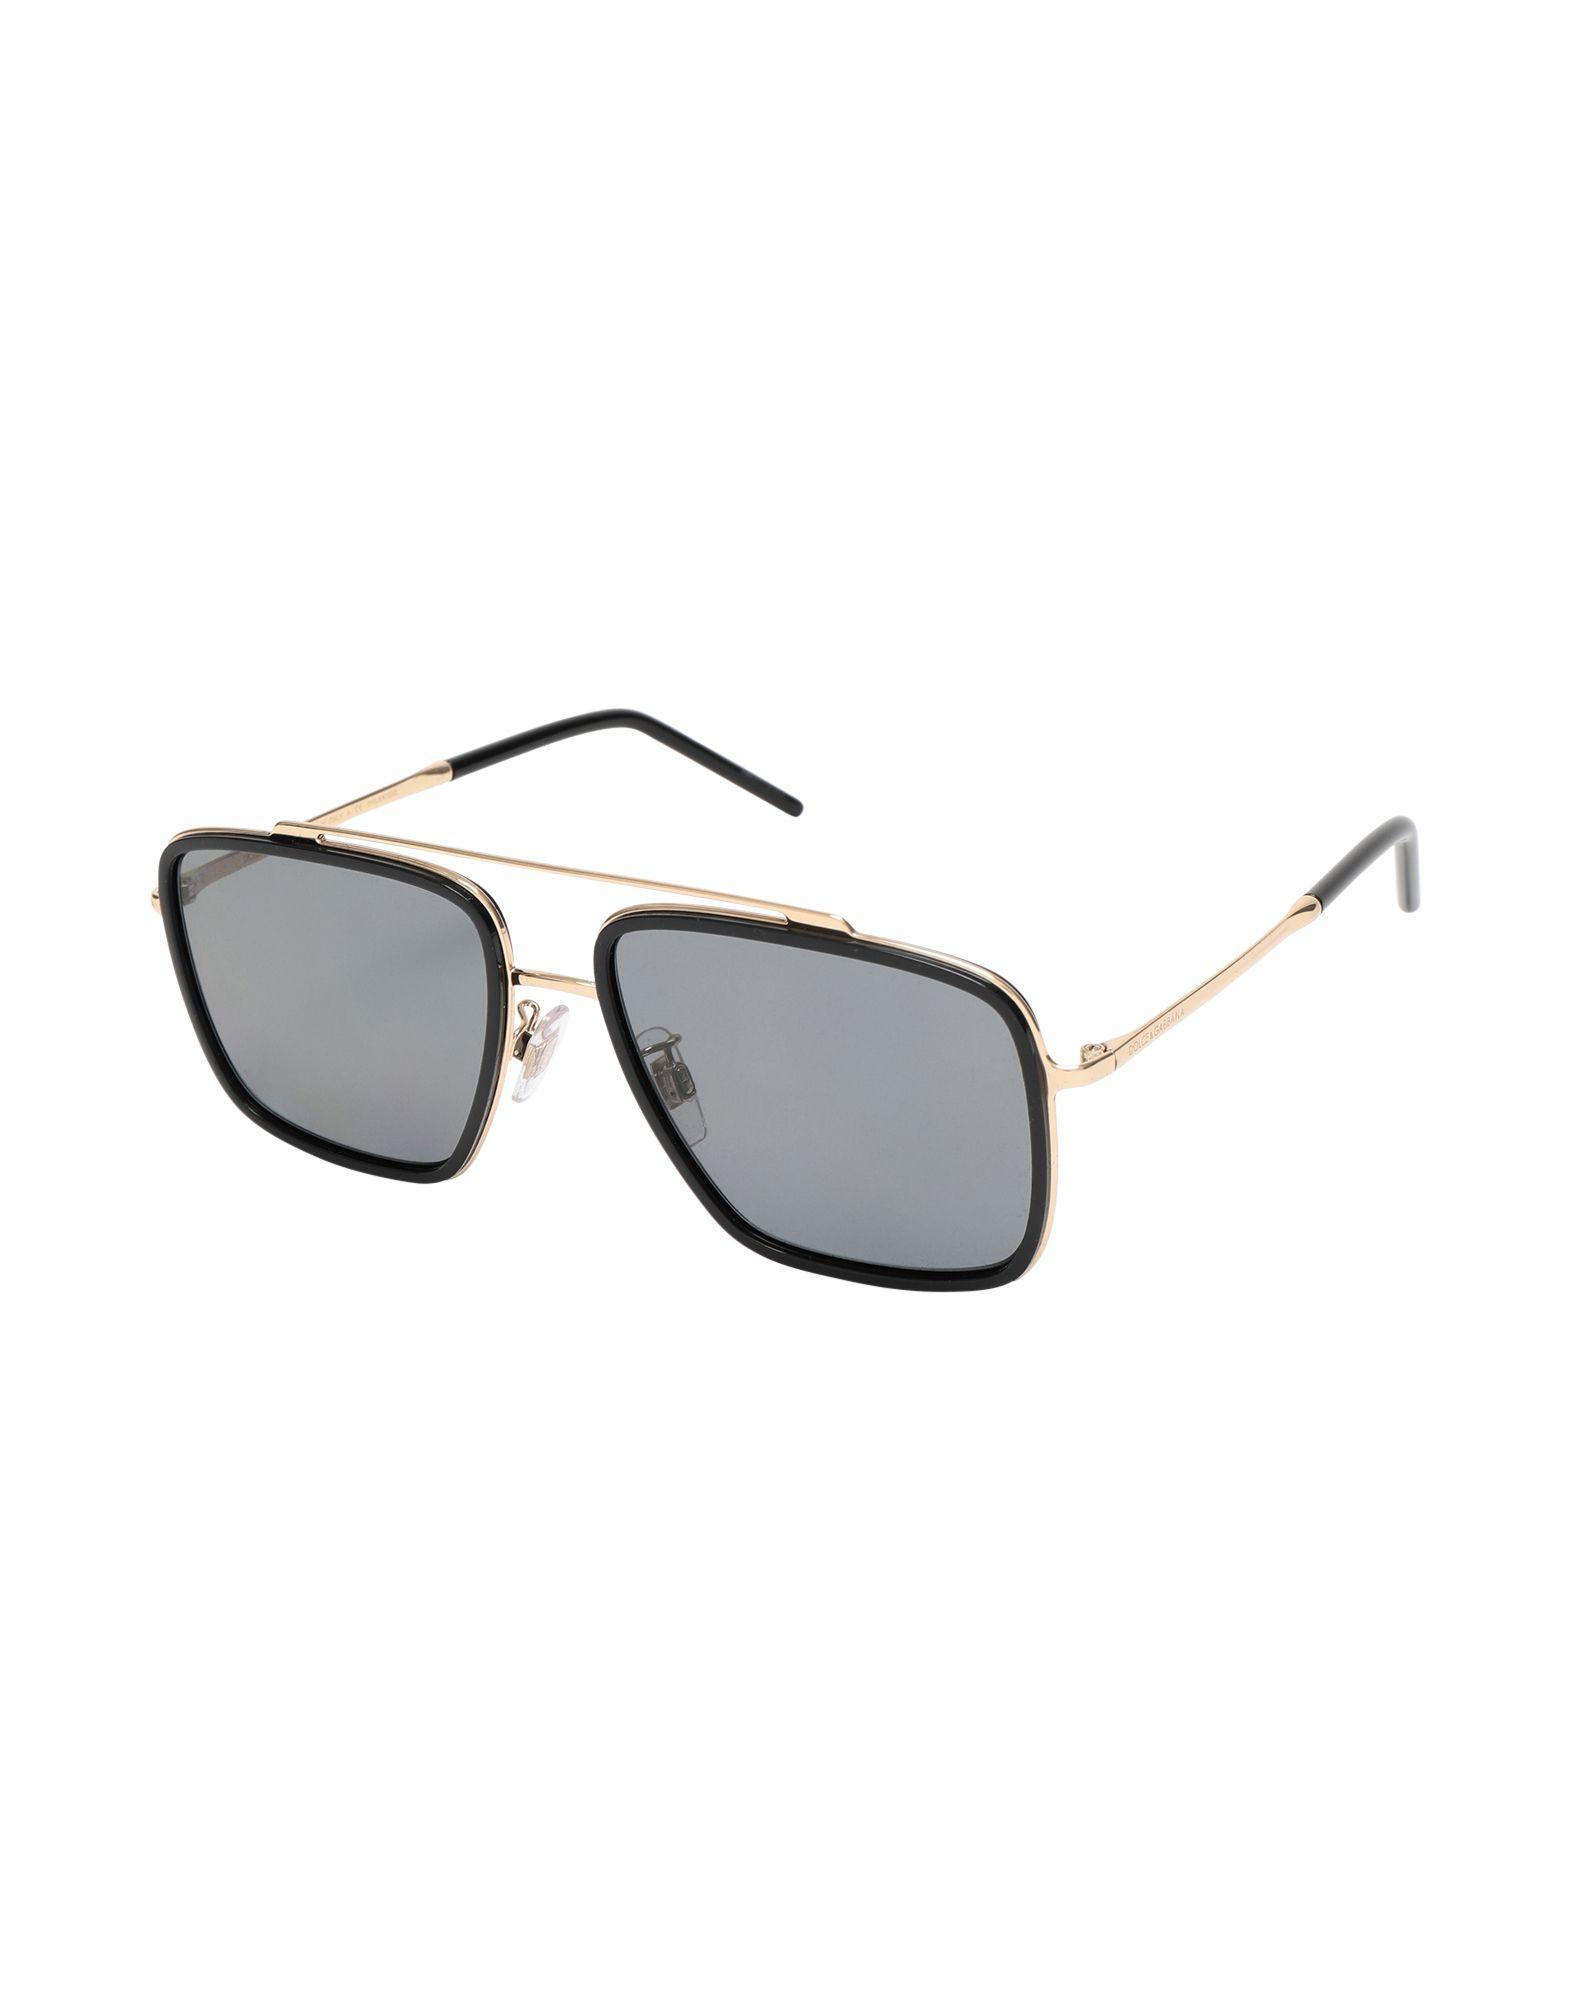 цена на DOLCE & GABBANA Солнечные очки